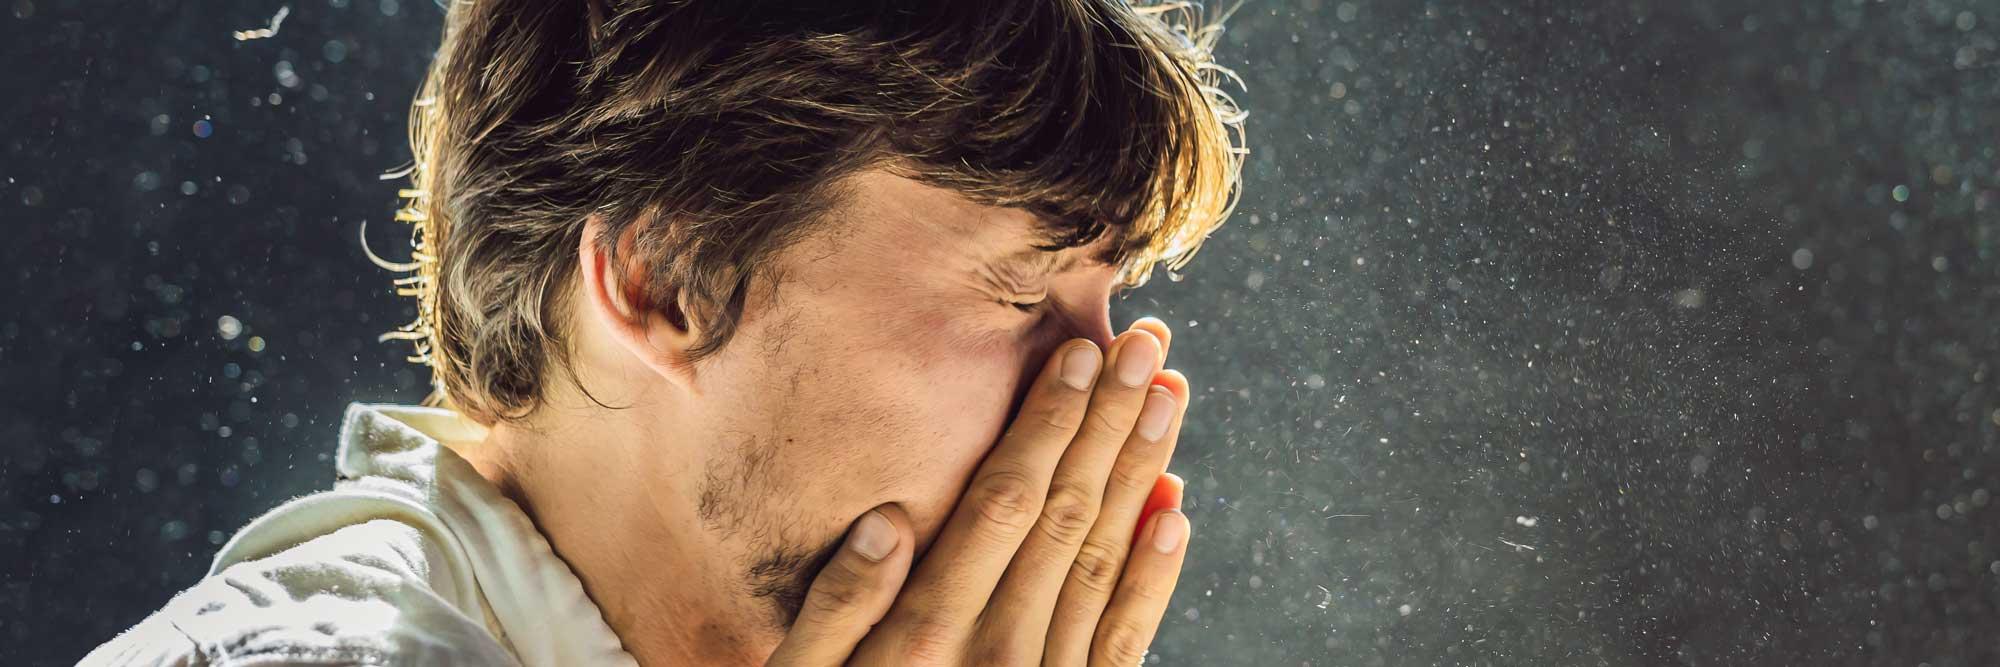 Man with allergies sneezing